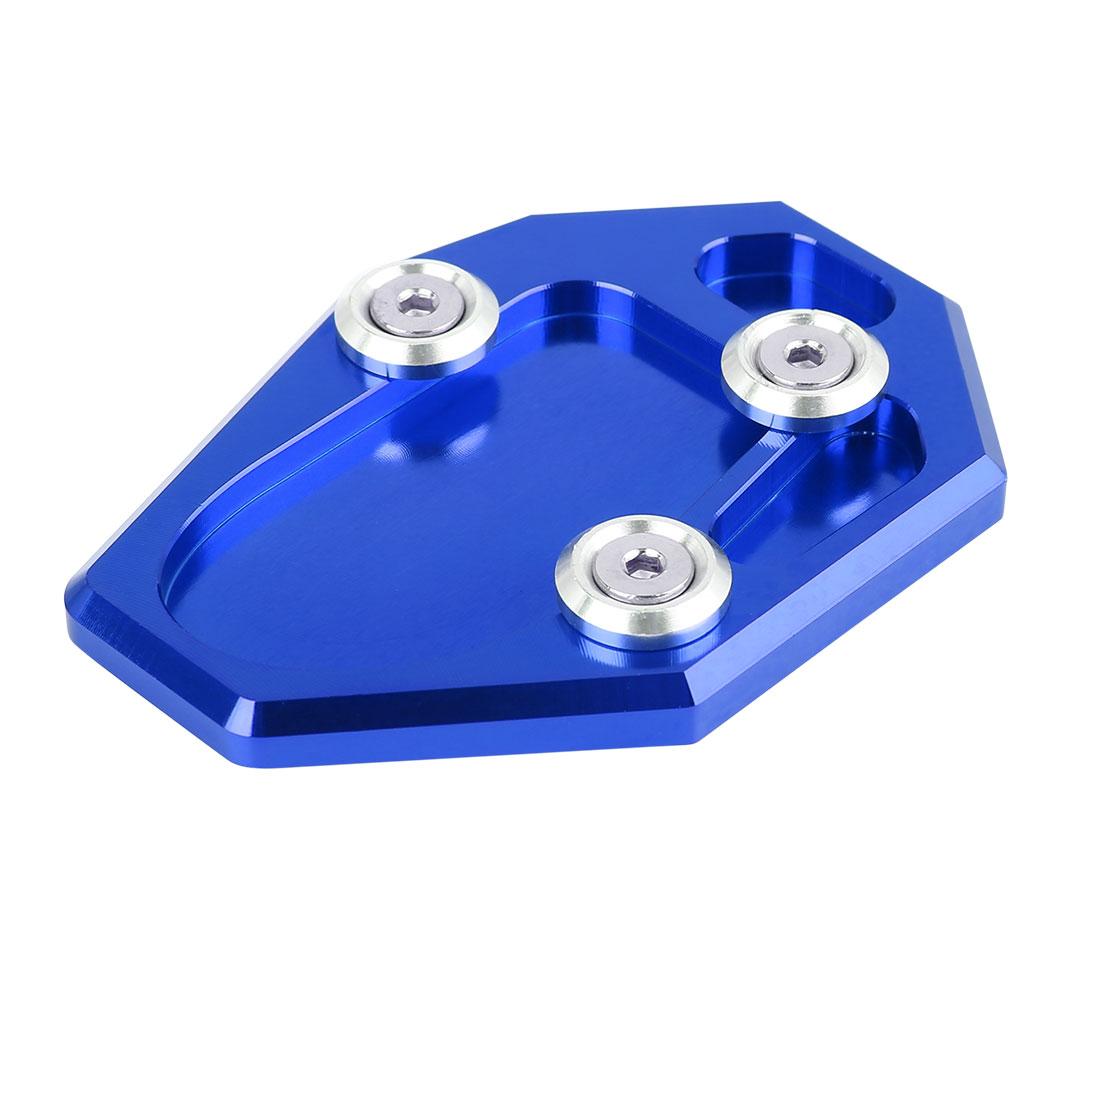 Blue Aluminium Alloy Nonslip Kickstand Enlarger Pad for Yamaha MT-07 FZ-07